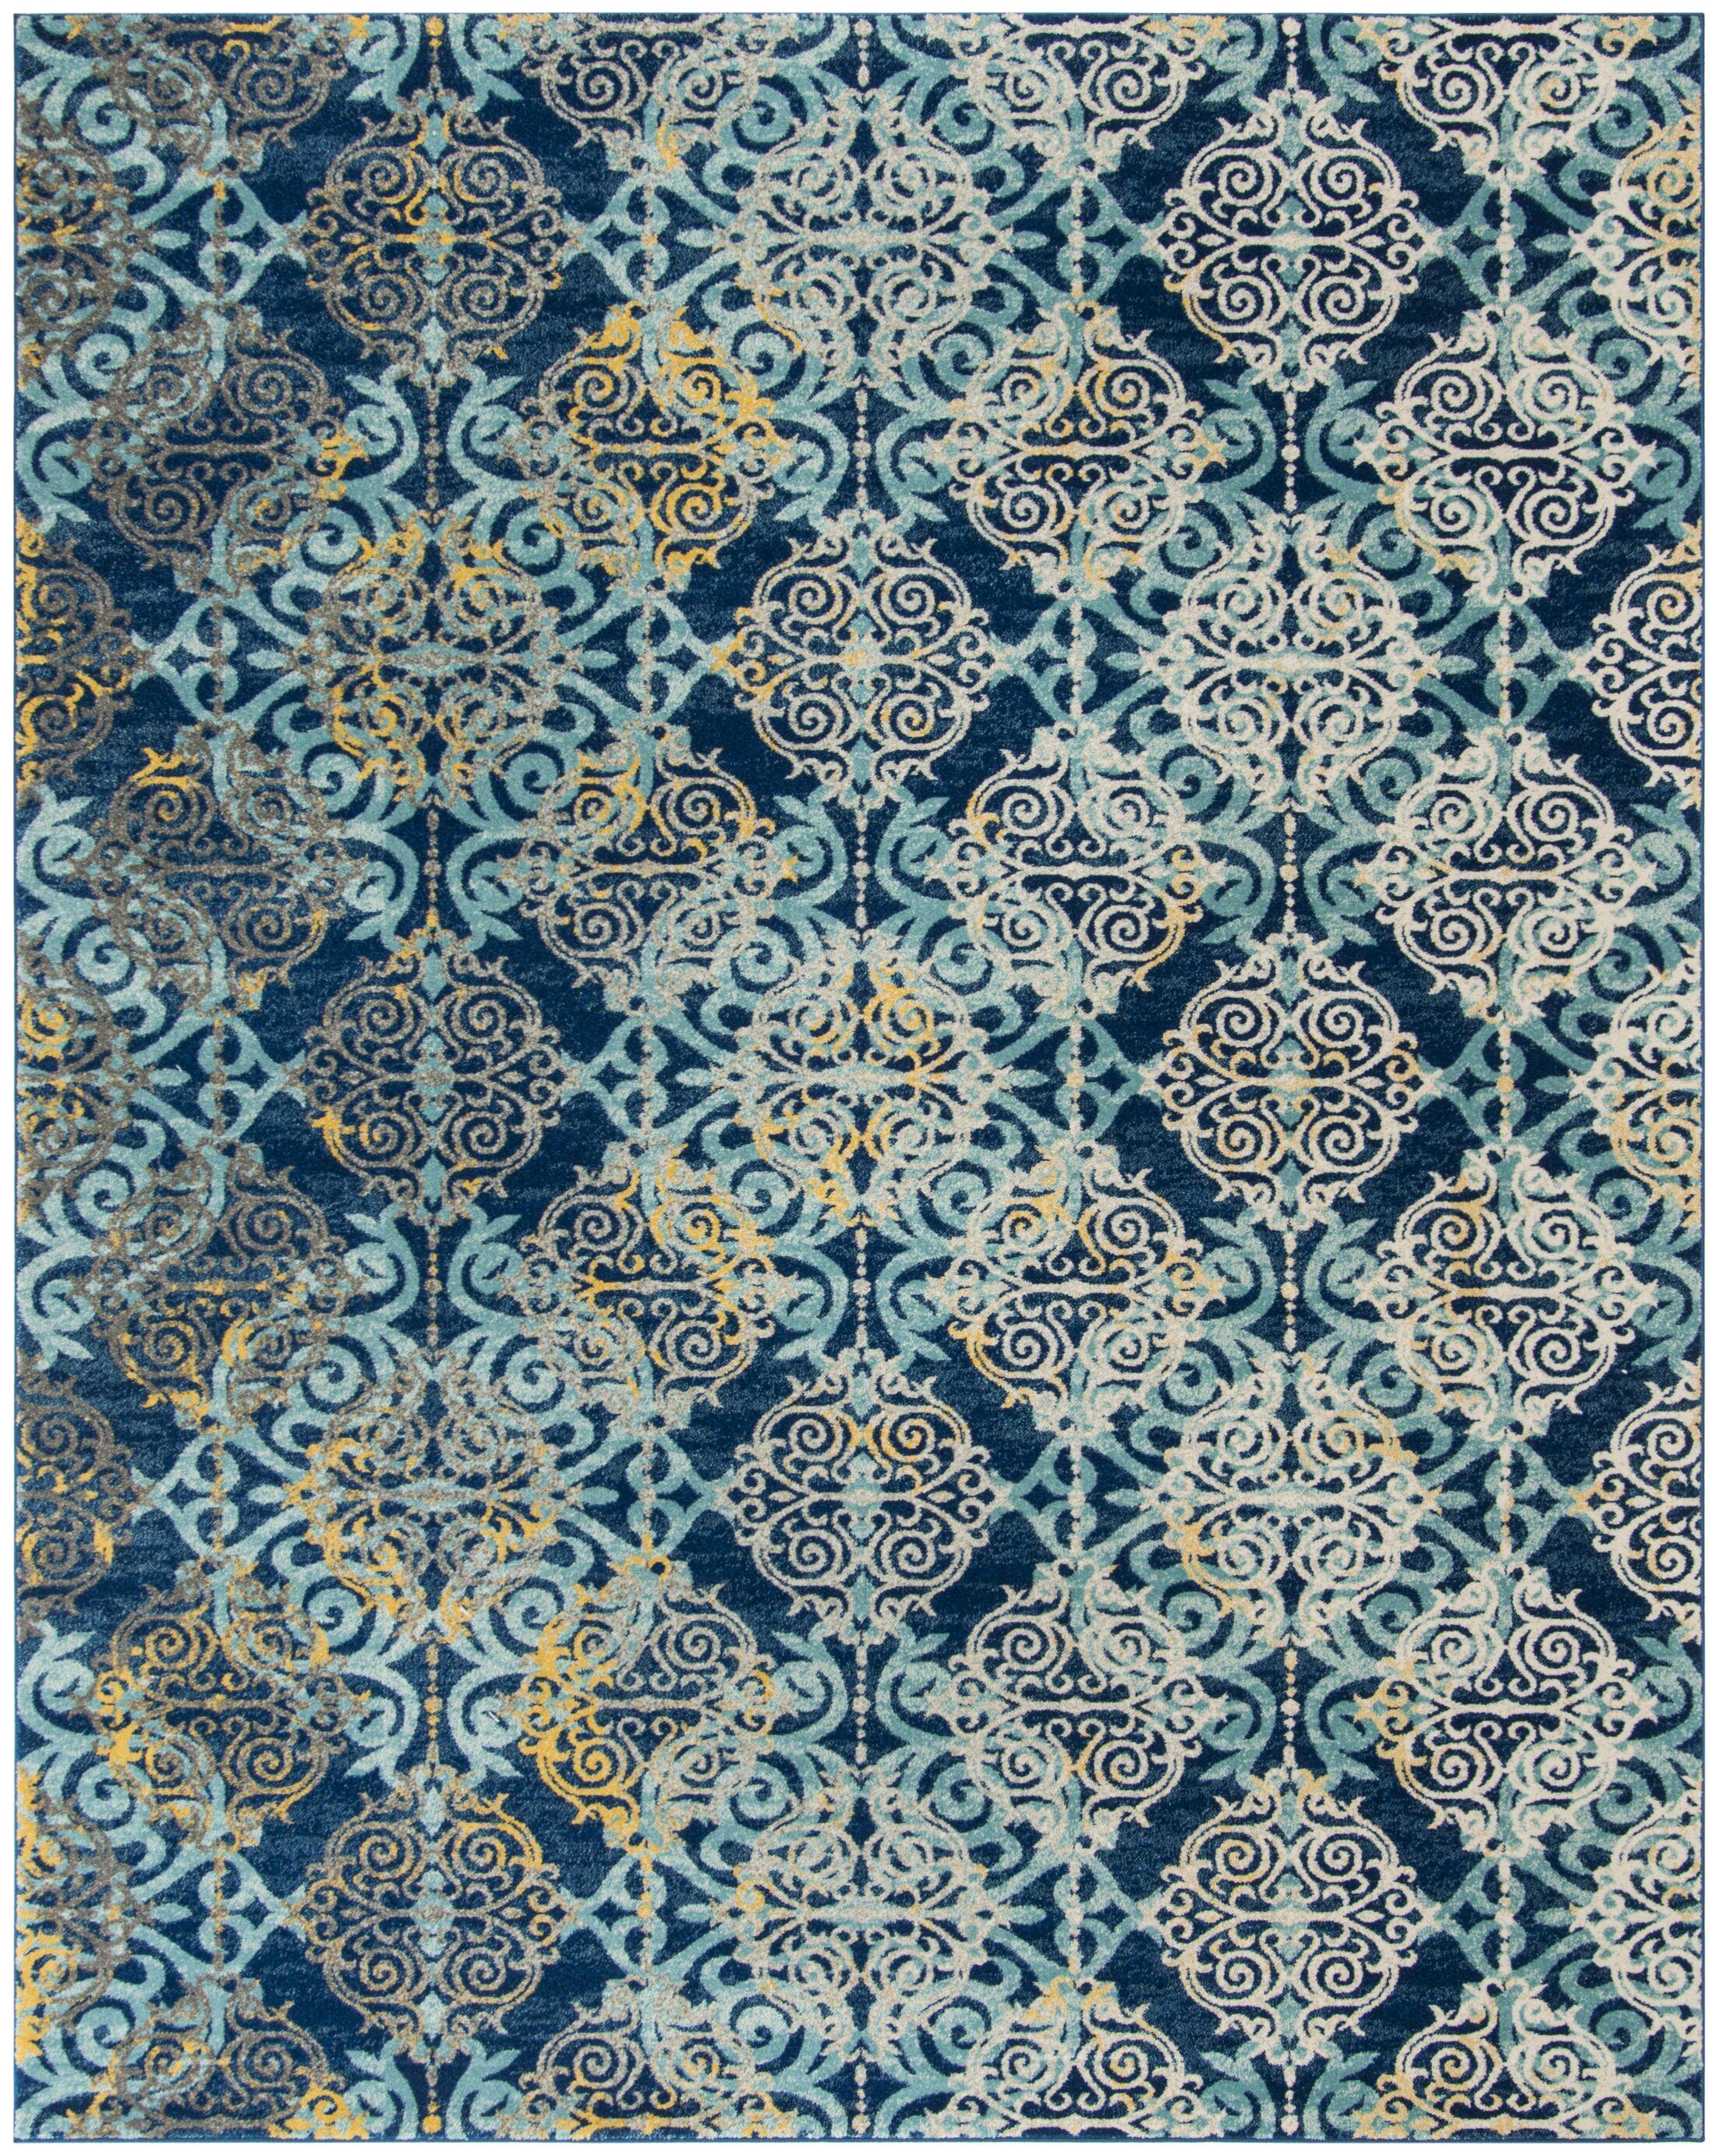 Ameesha Blue/Gray Area Rug Rug Size: Rectangle 9' x 12'